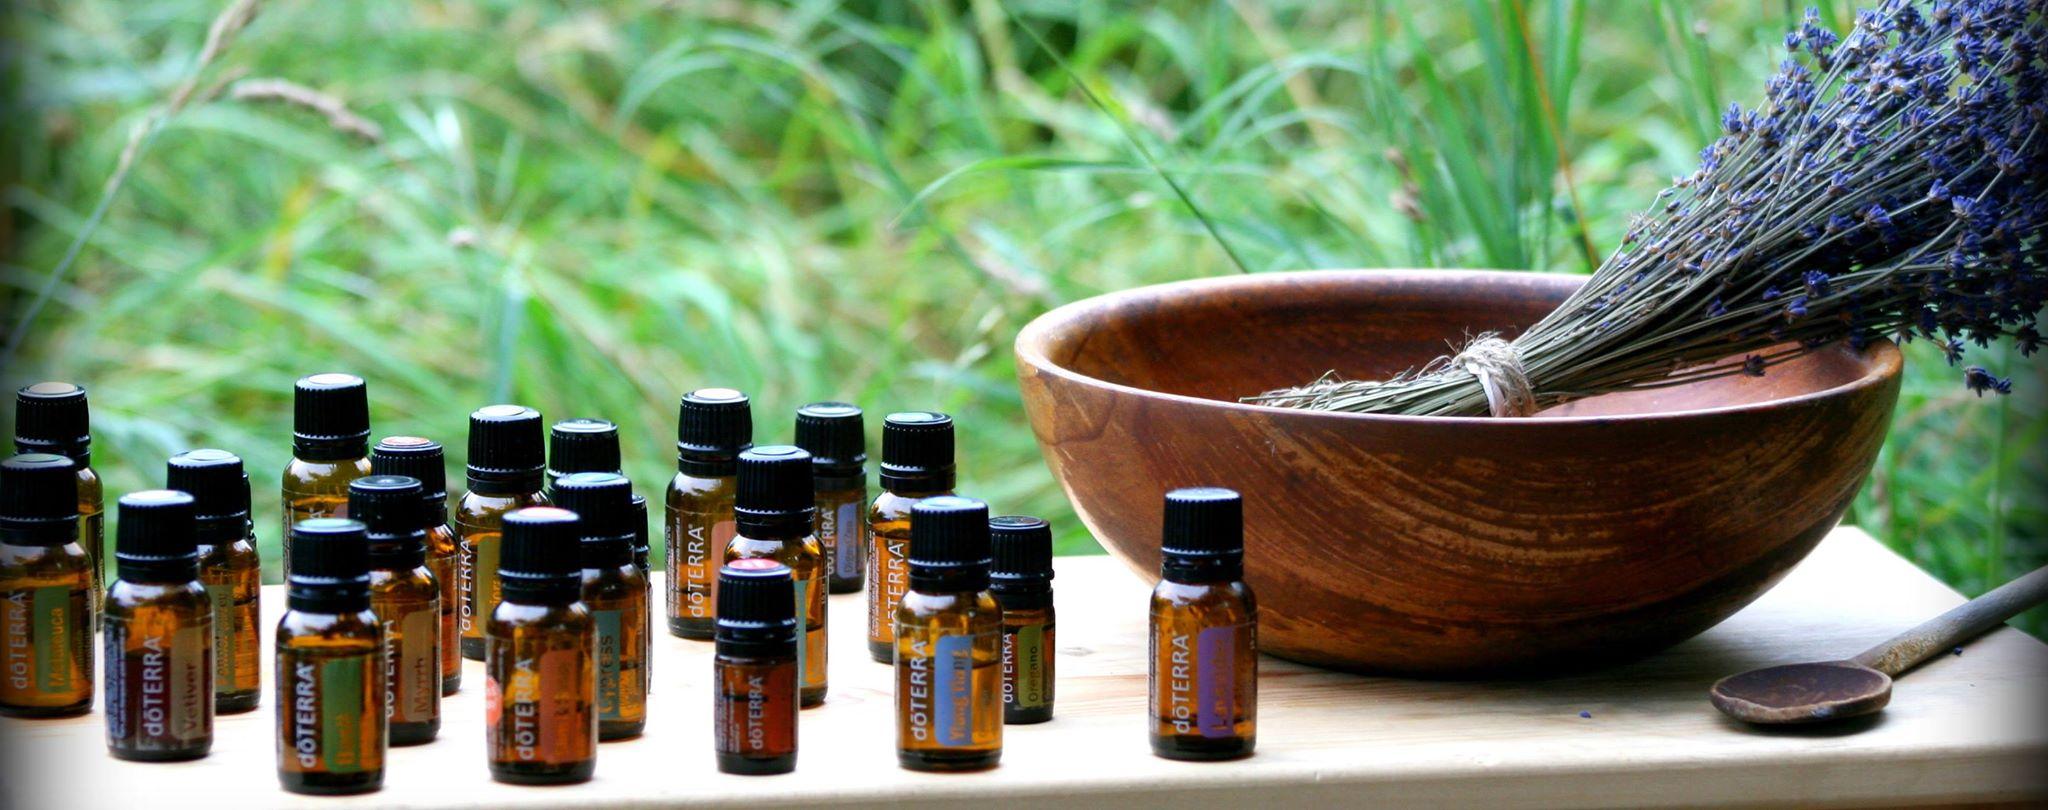 doterra bottles and herbs